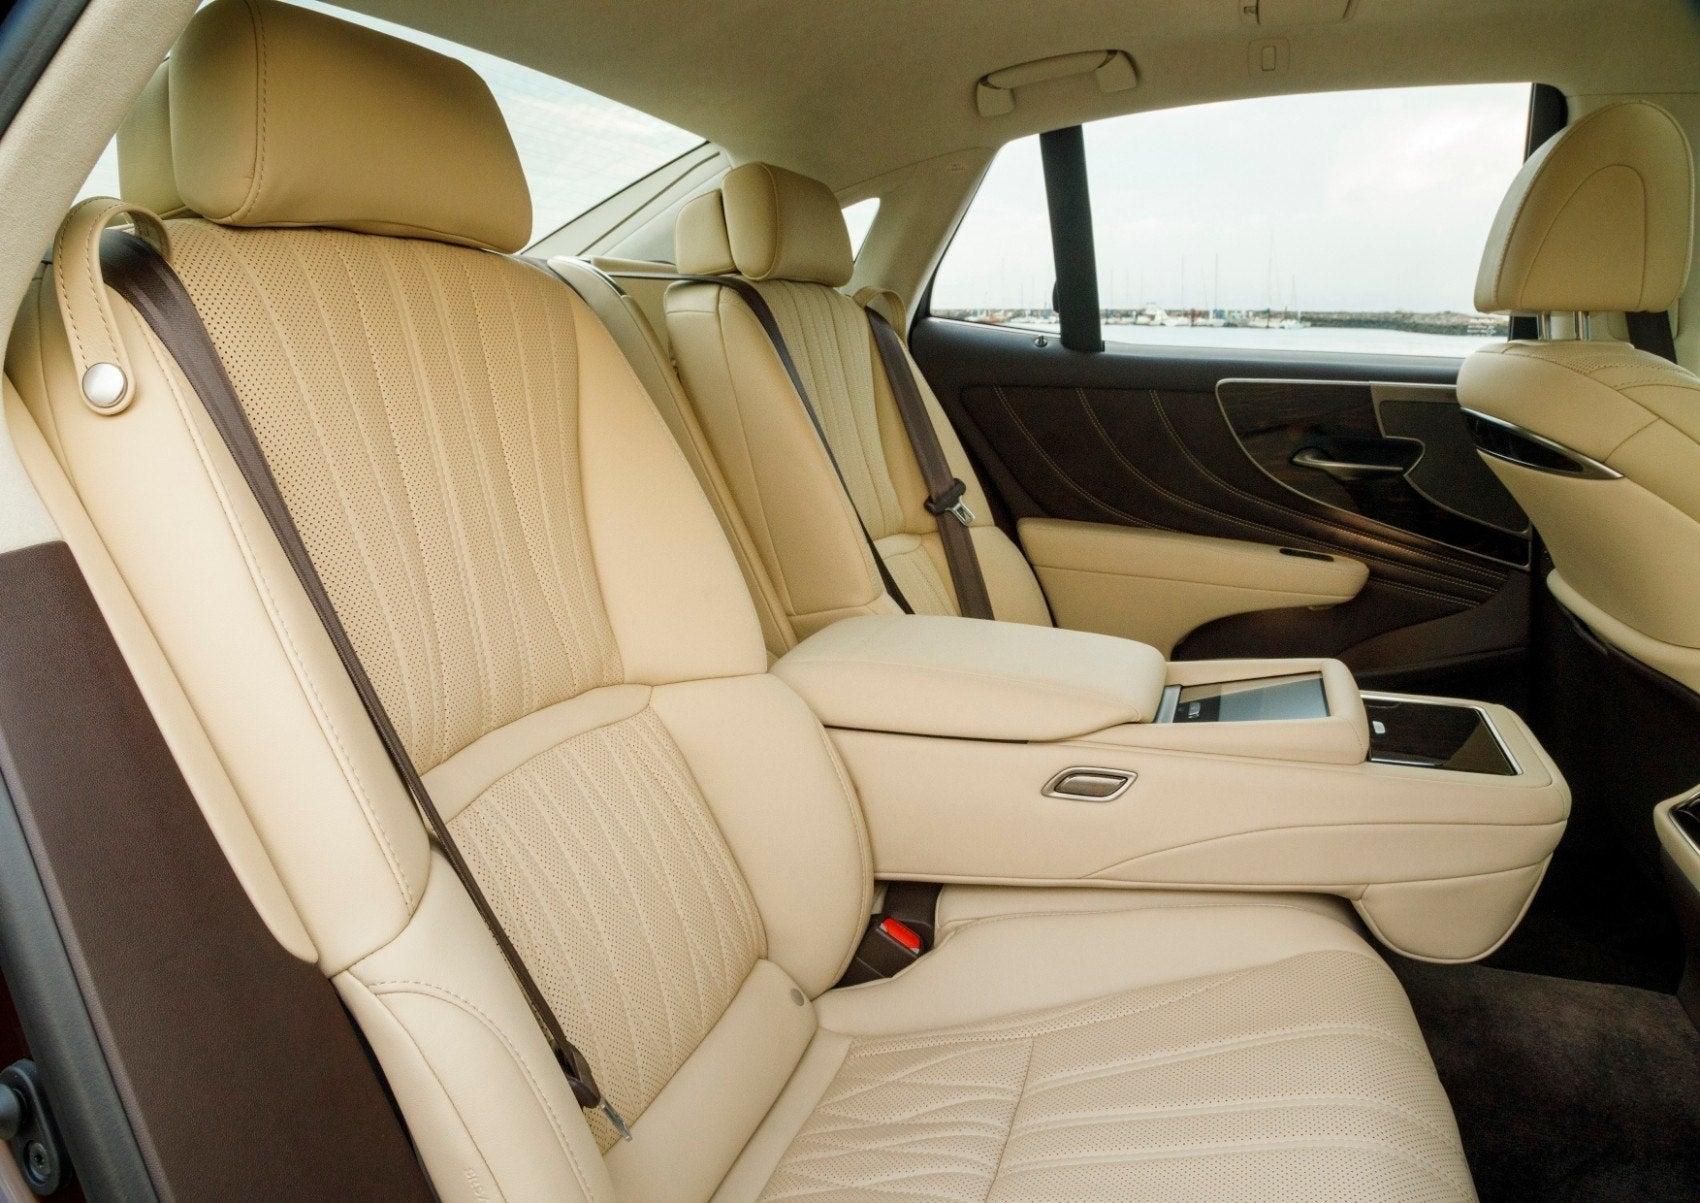 2020 Lexus LS 500 rear seat layout.